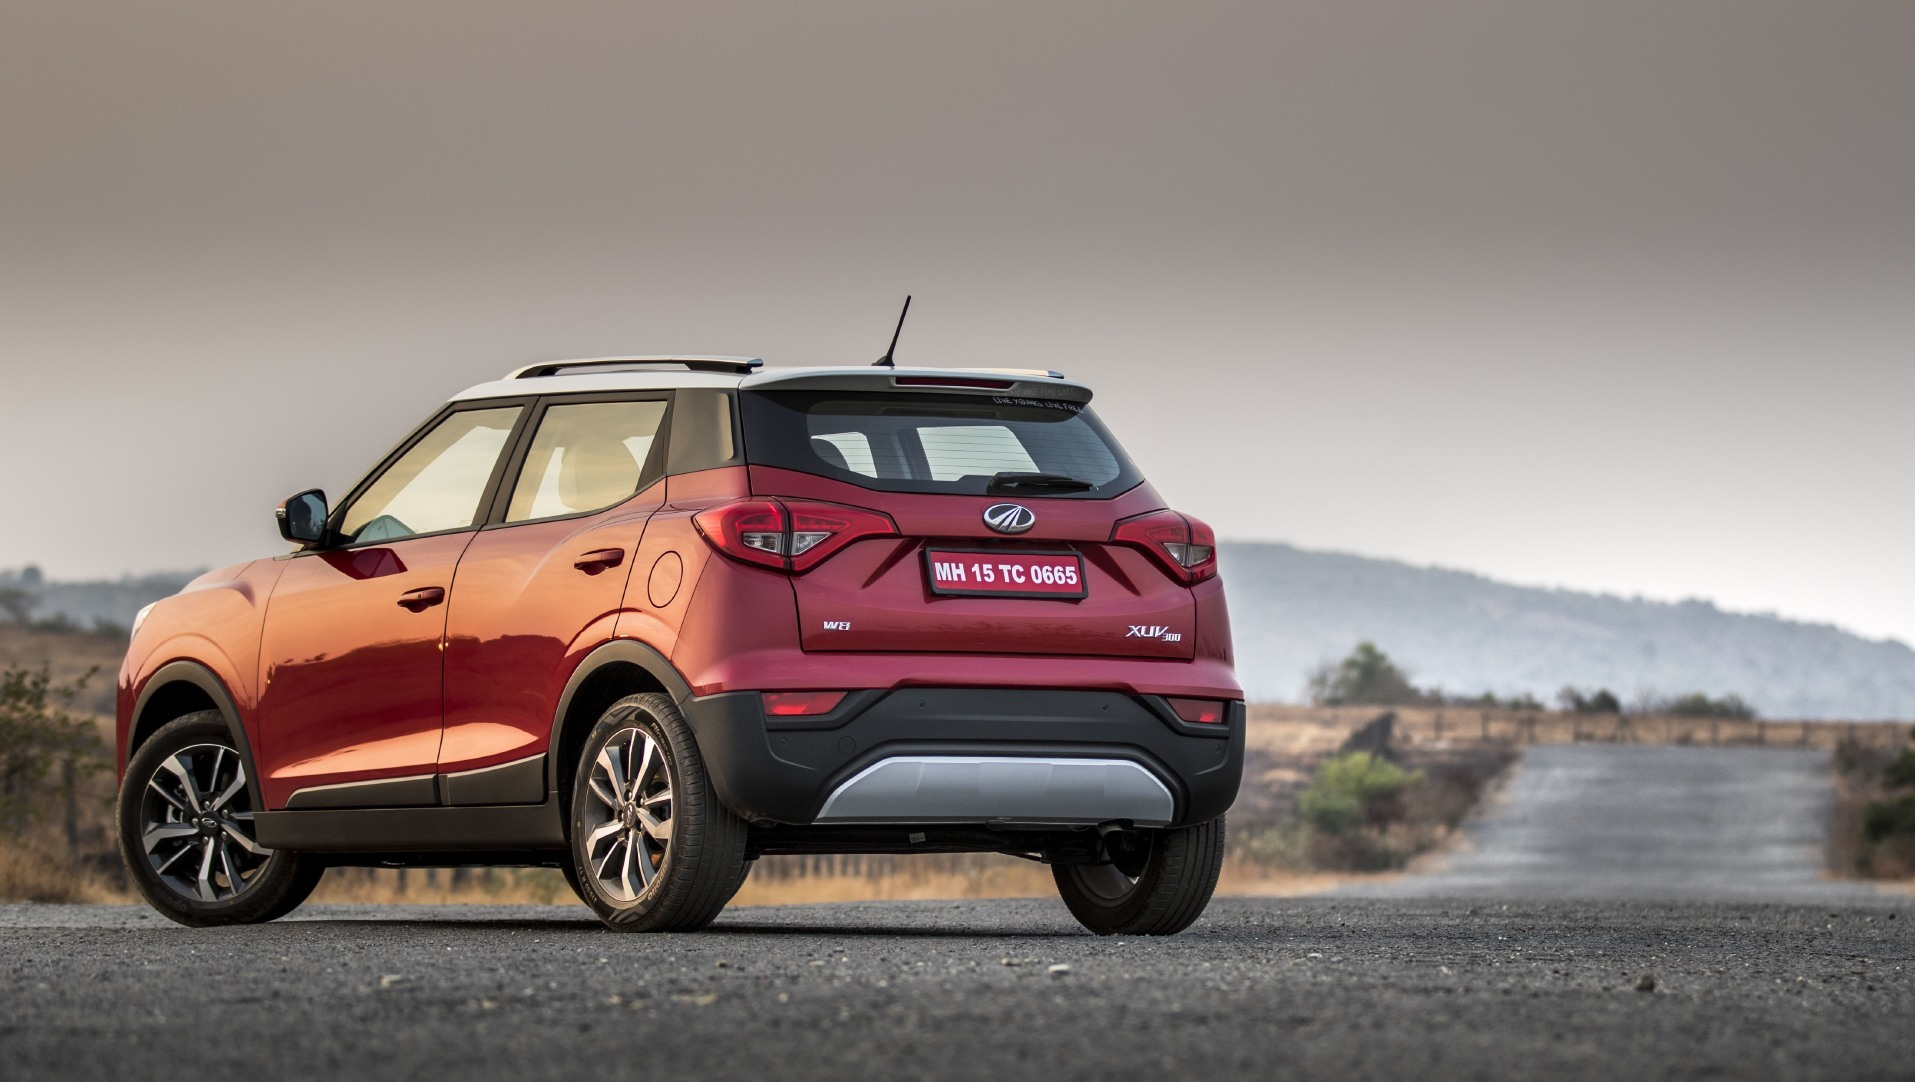 Mahindra and Mahindra, XUV300, Mahindra XUV300, Car and bike news, Automobile news